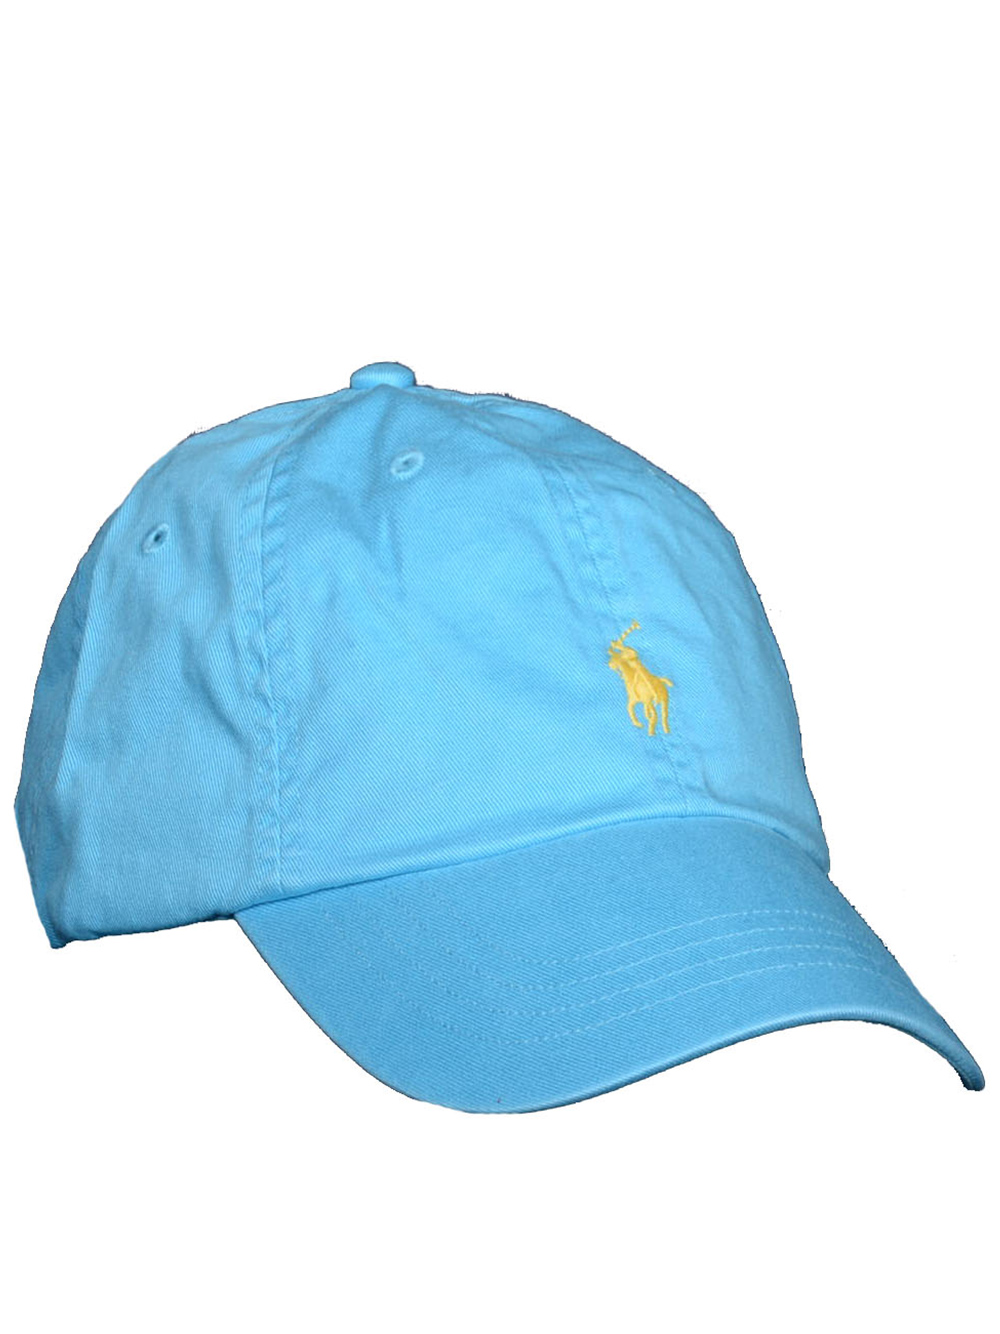 POLO RALPH LAUREN Καπέλο jockey 710667709021 ΤΥΡΚΟΥΑΖ